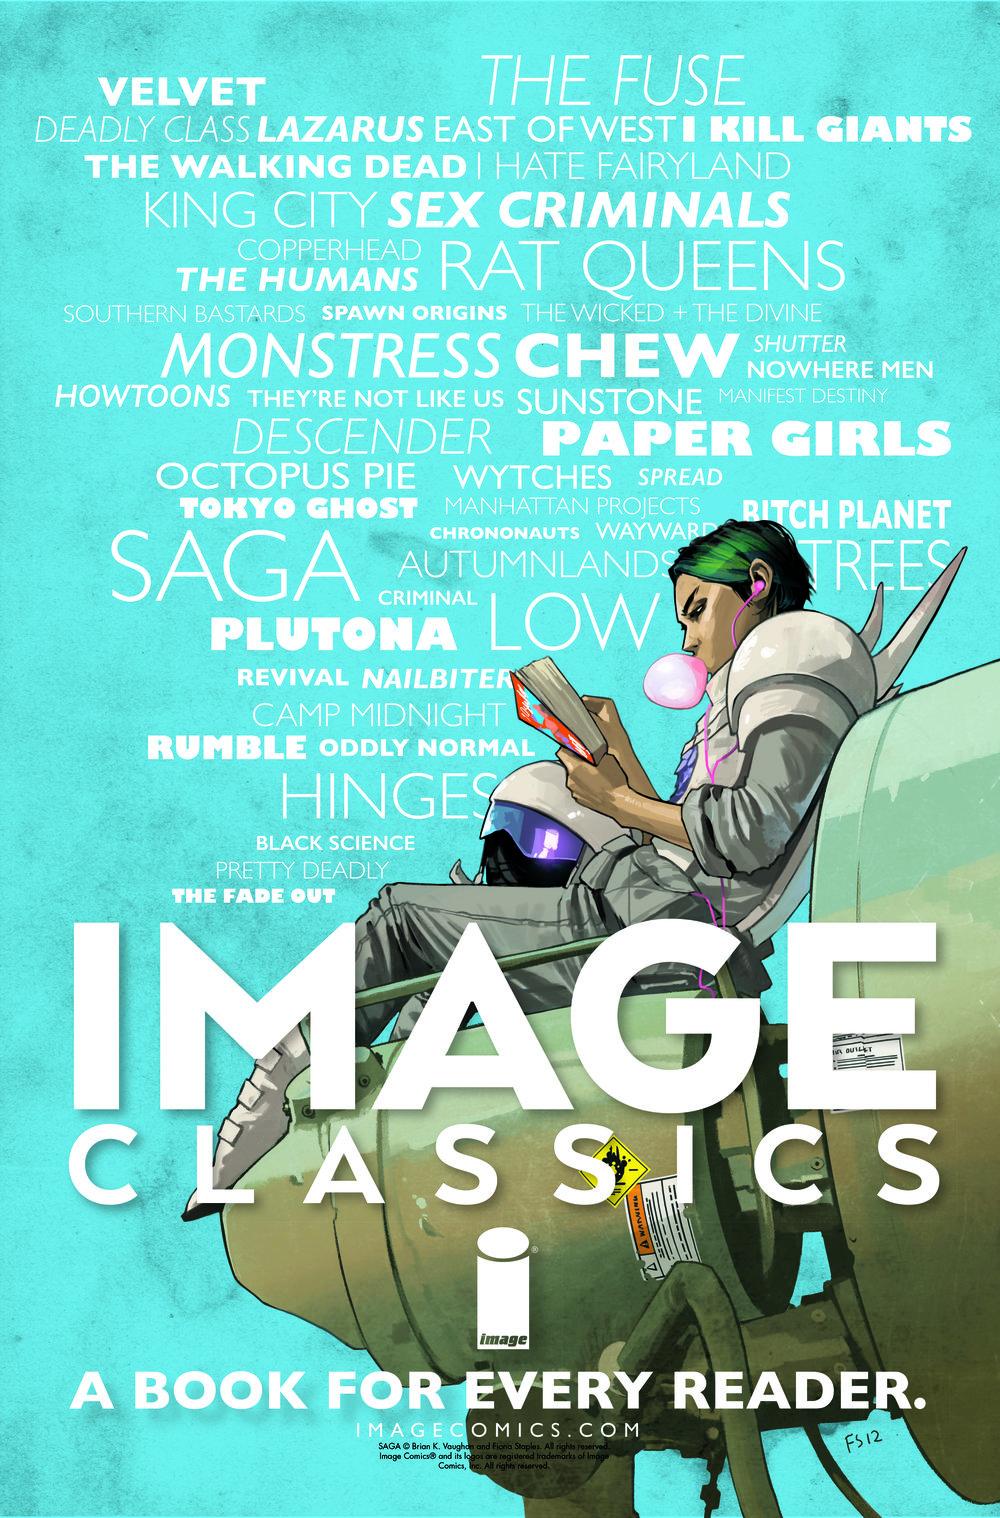 Image Classics ad